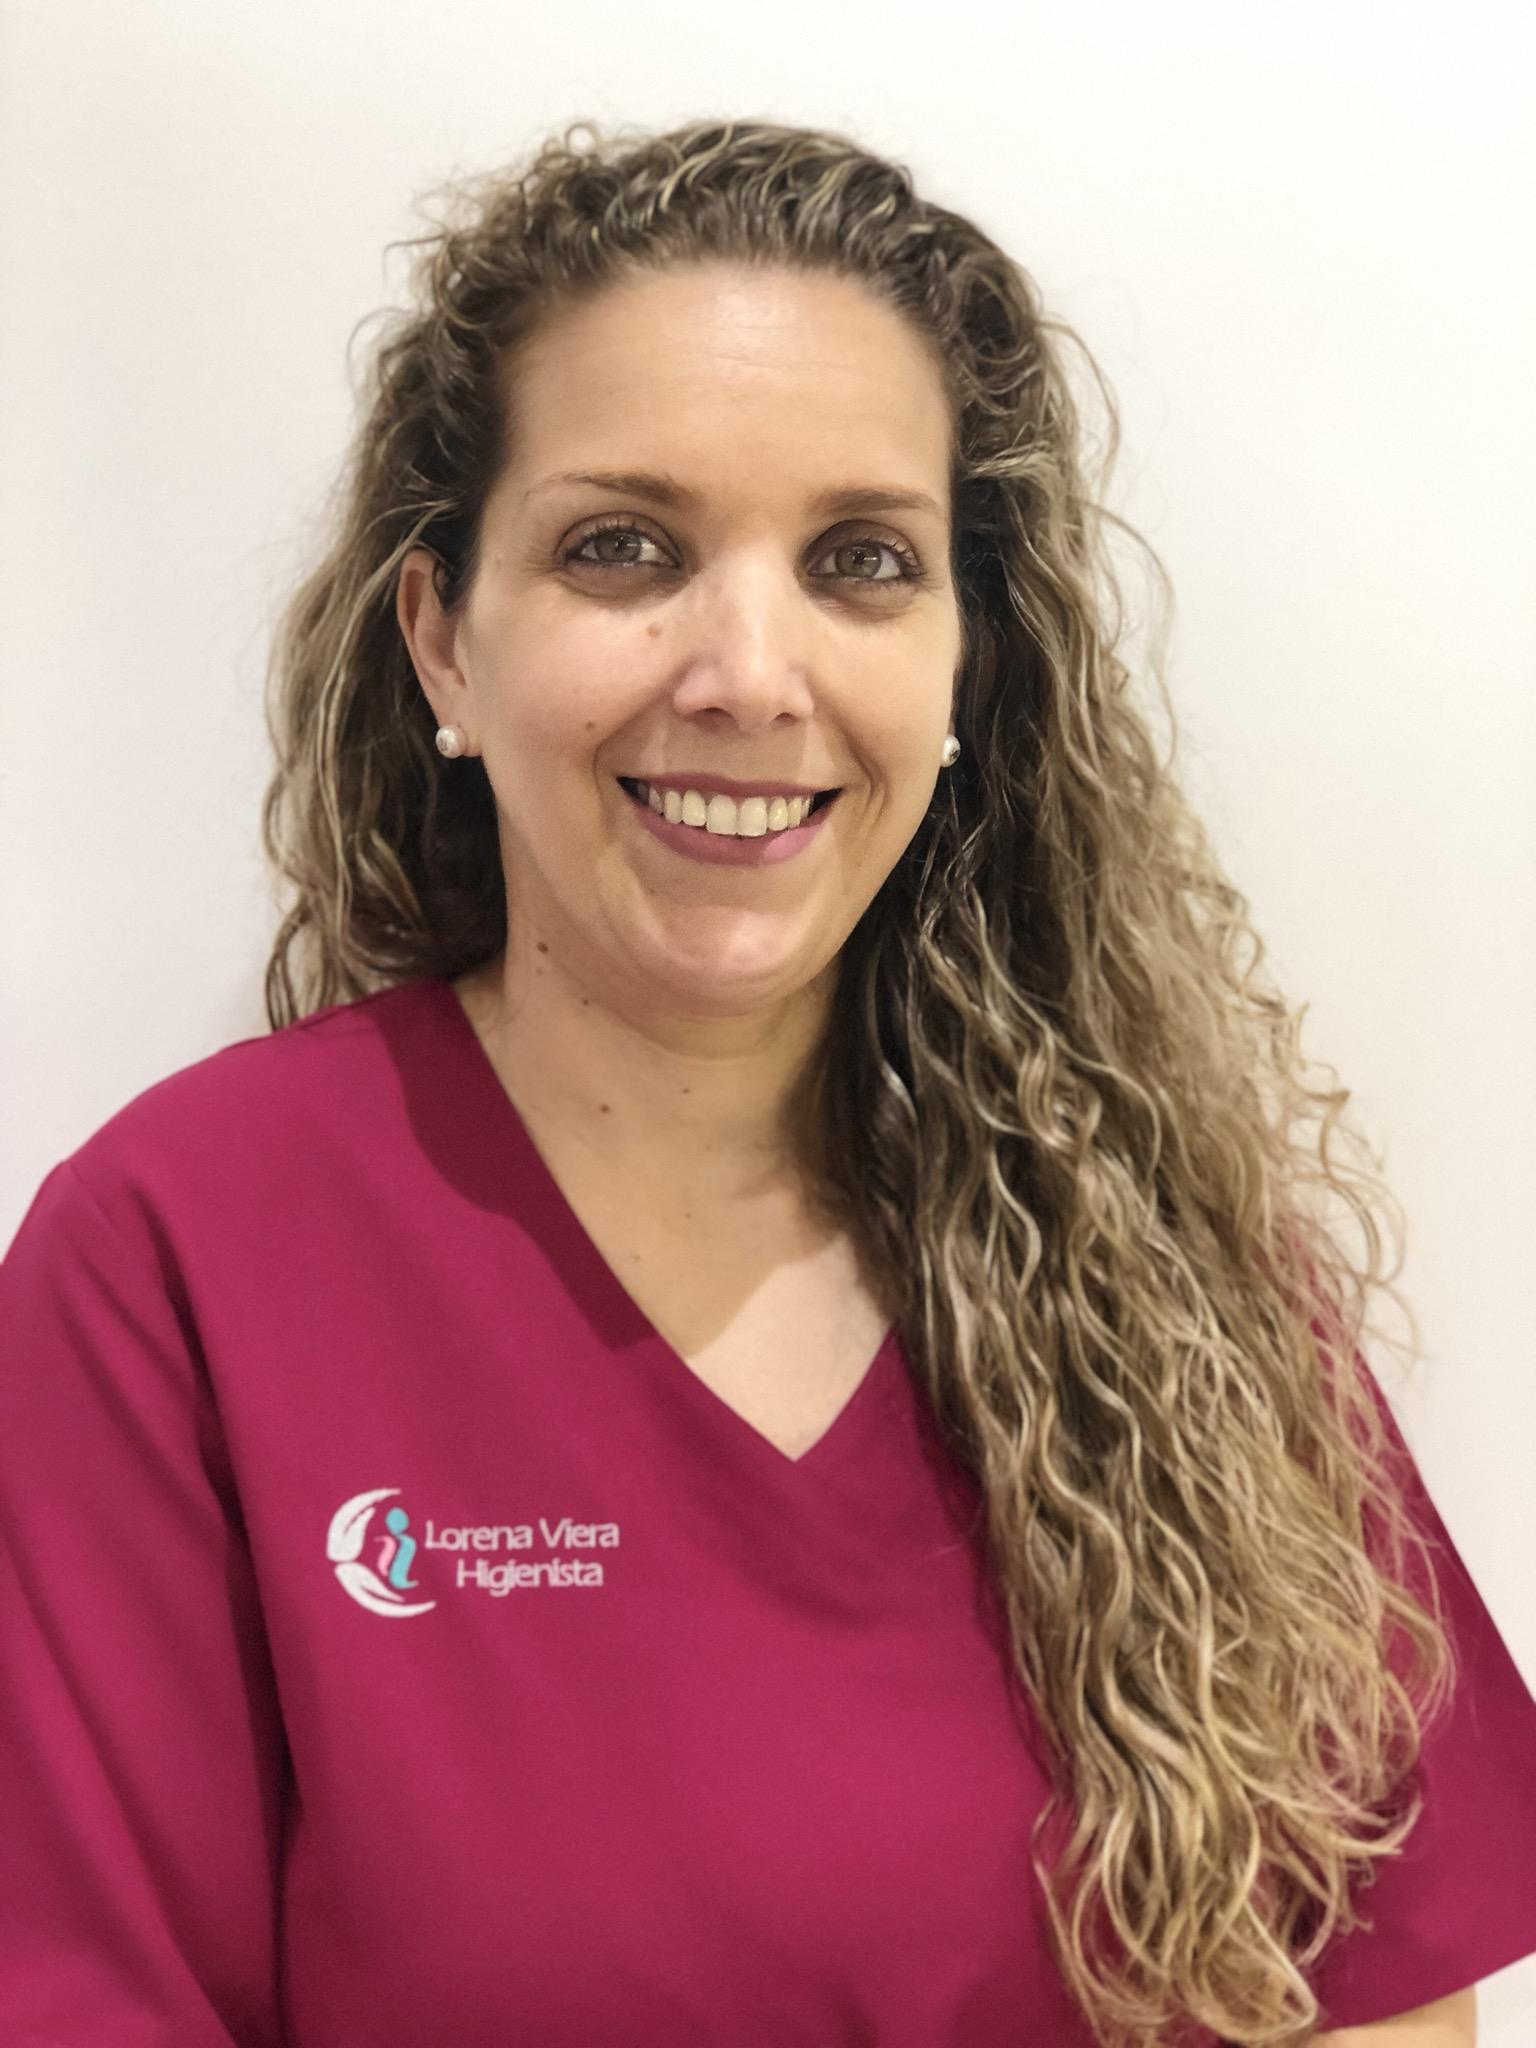 Higienista Lorena Viera